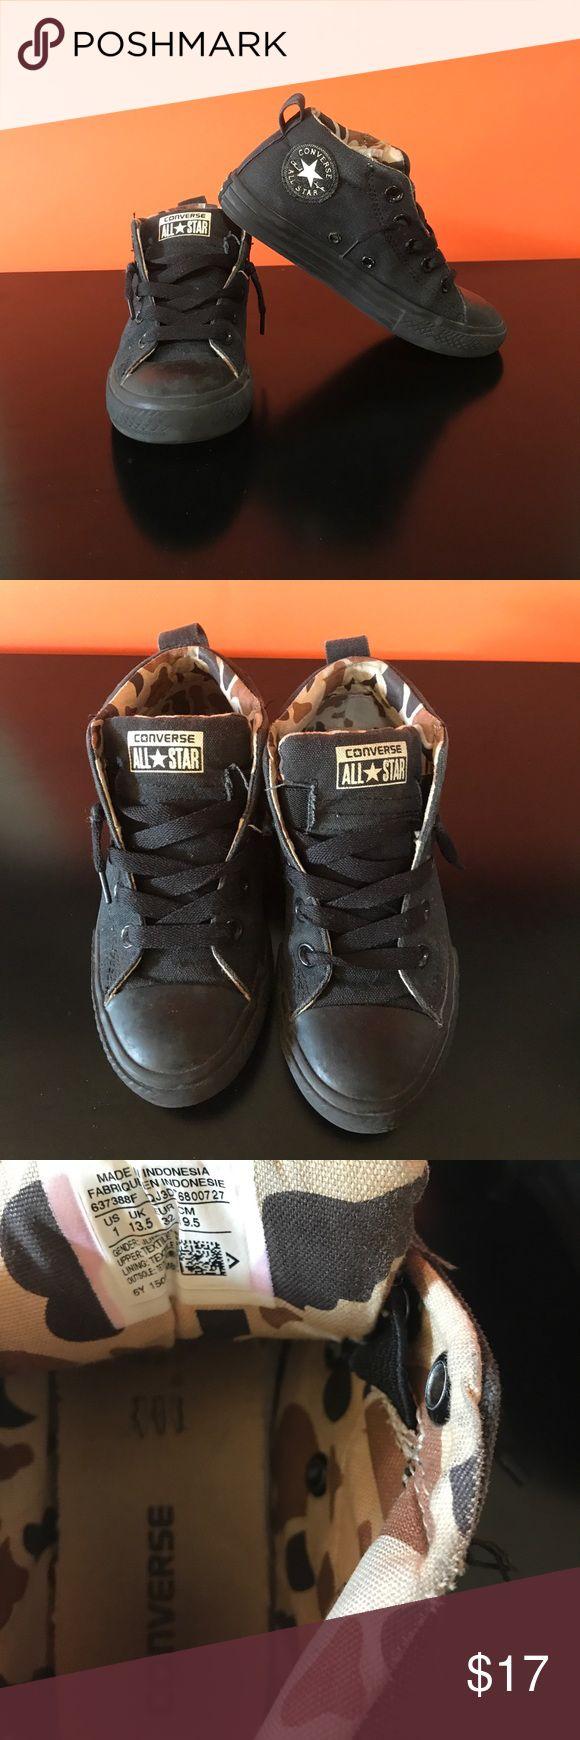 Boys Converse slip on sneaker Size 1 boys black sneaker. Easy wear with no hassle shoe strings.  Great uniform shoe.  Nearly new. Converse Shoes Sneakers